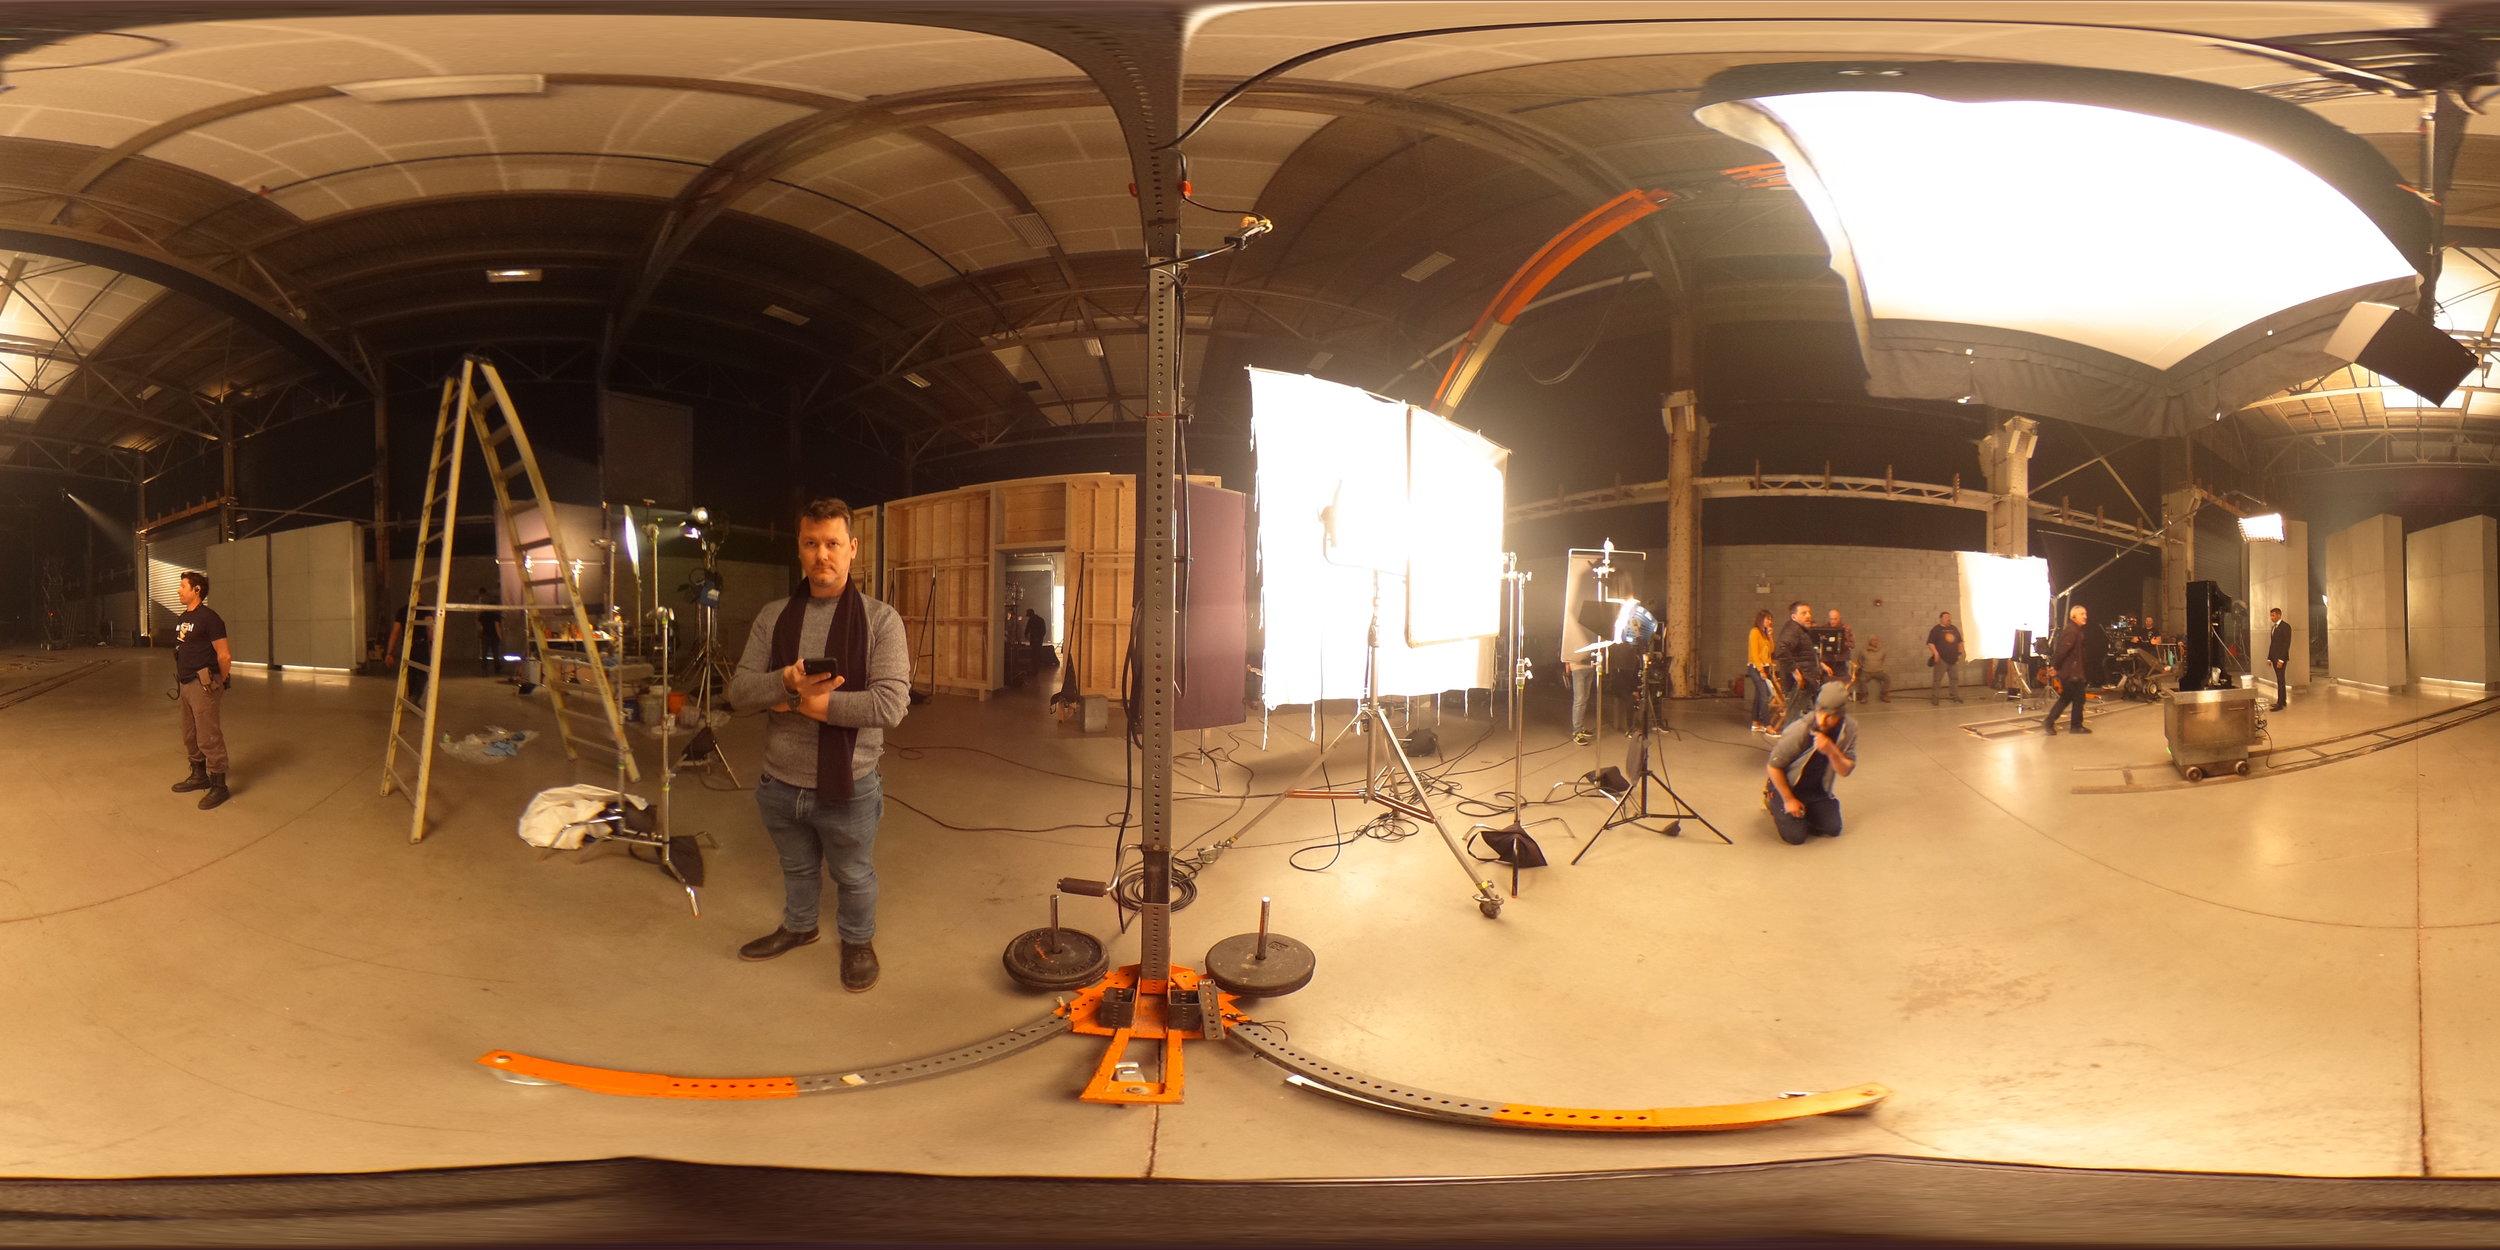 Onset VFX Supervision PENZOIL - Marc Morissette supervized the Visual Effects side for LA VFX Studio ElectricTheatre.